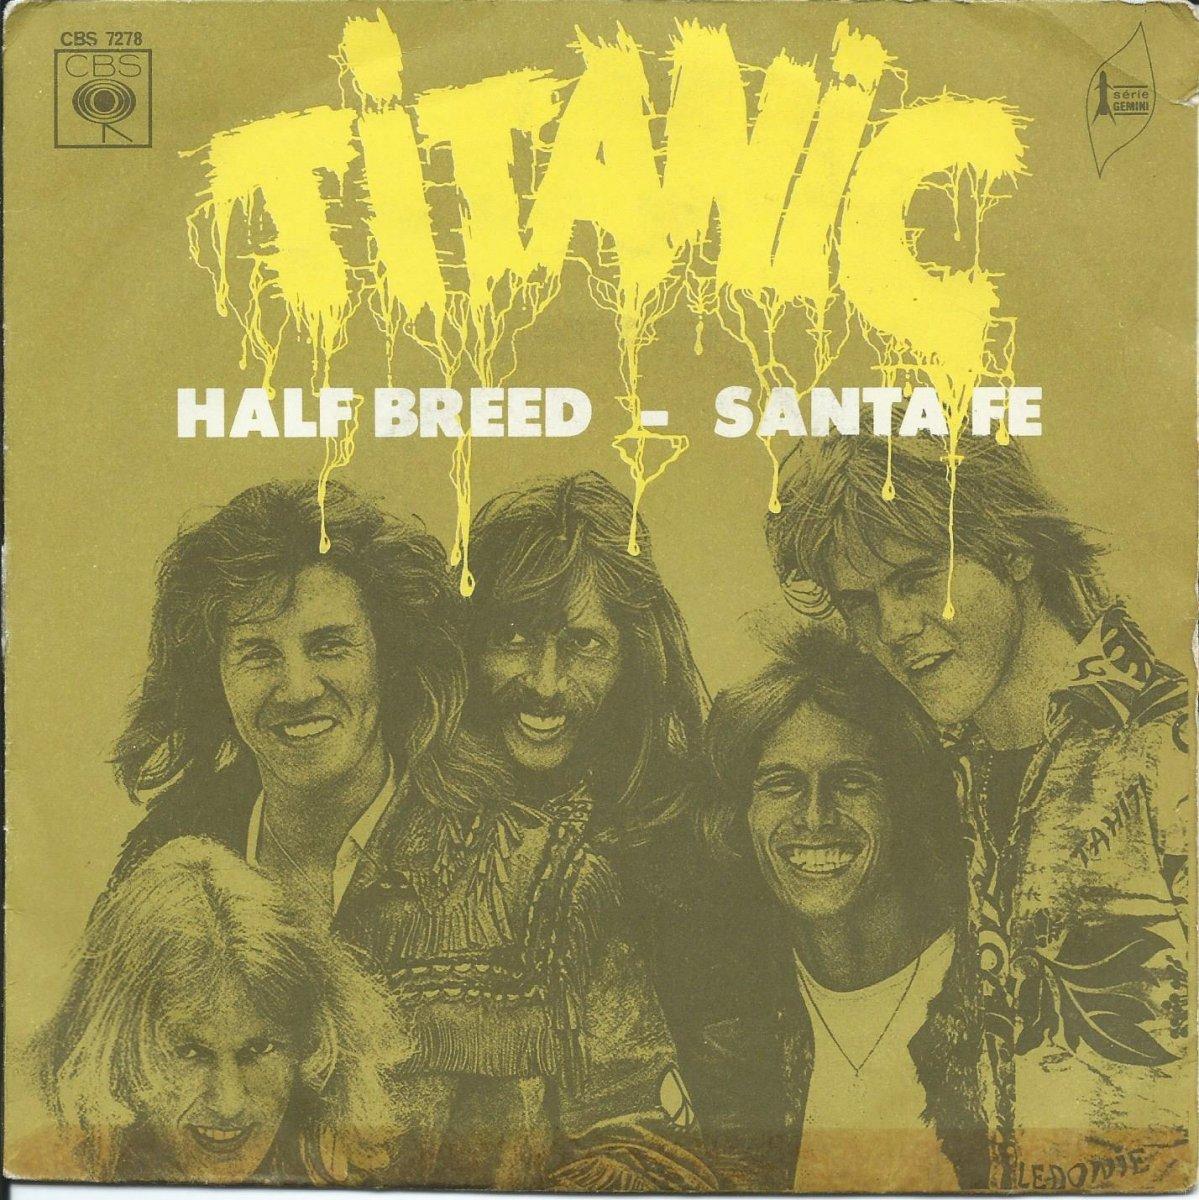 TITANIC / HALF BREED / SANTA FE (7